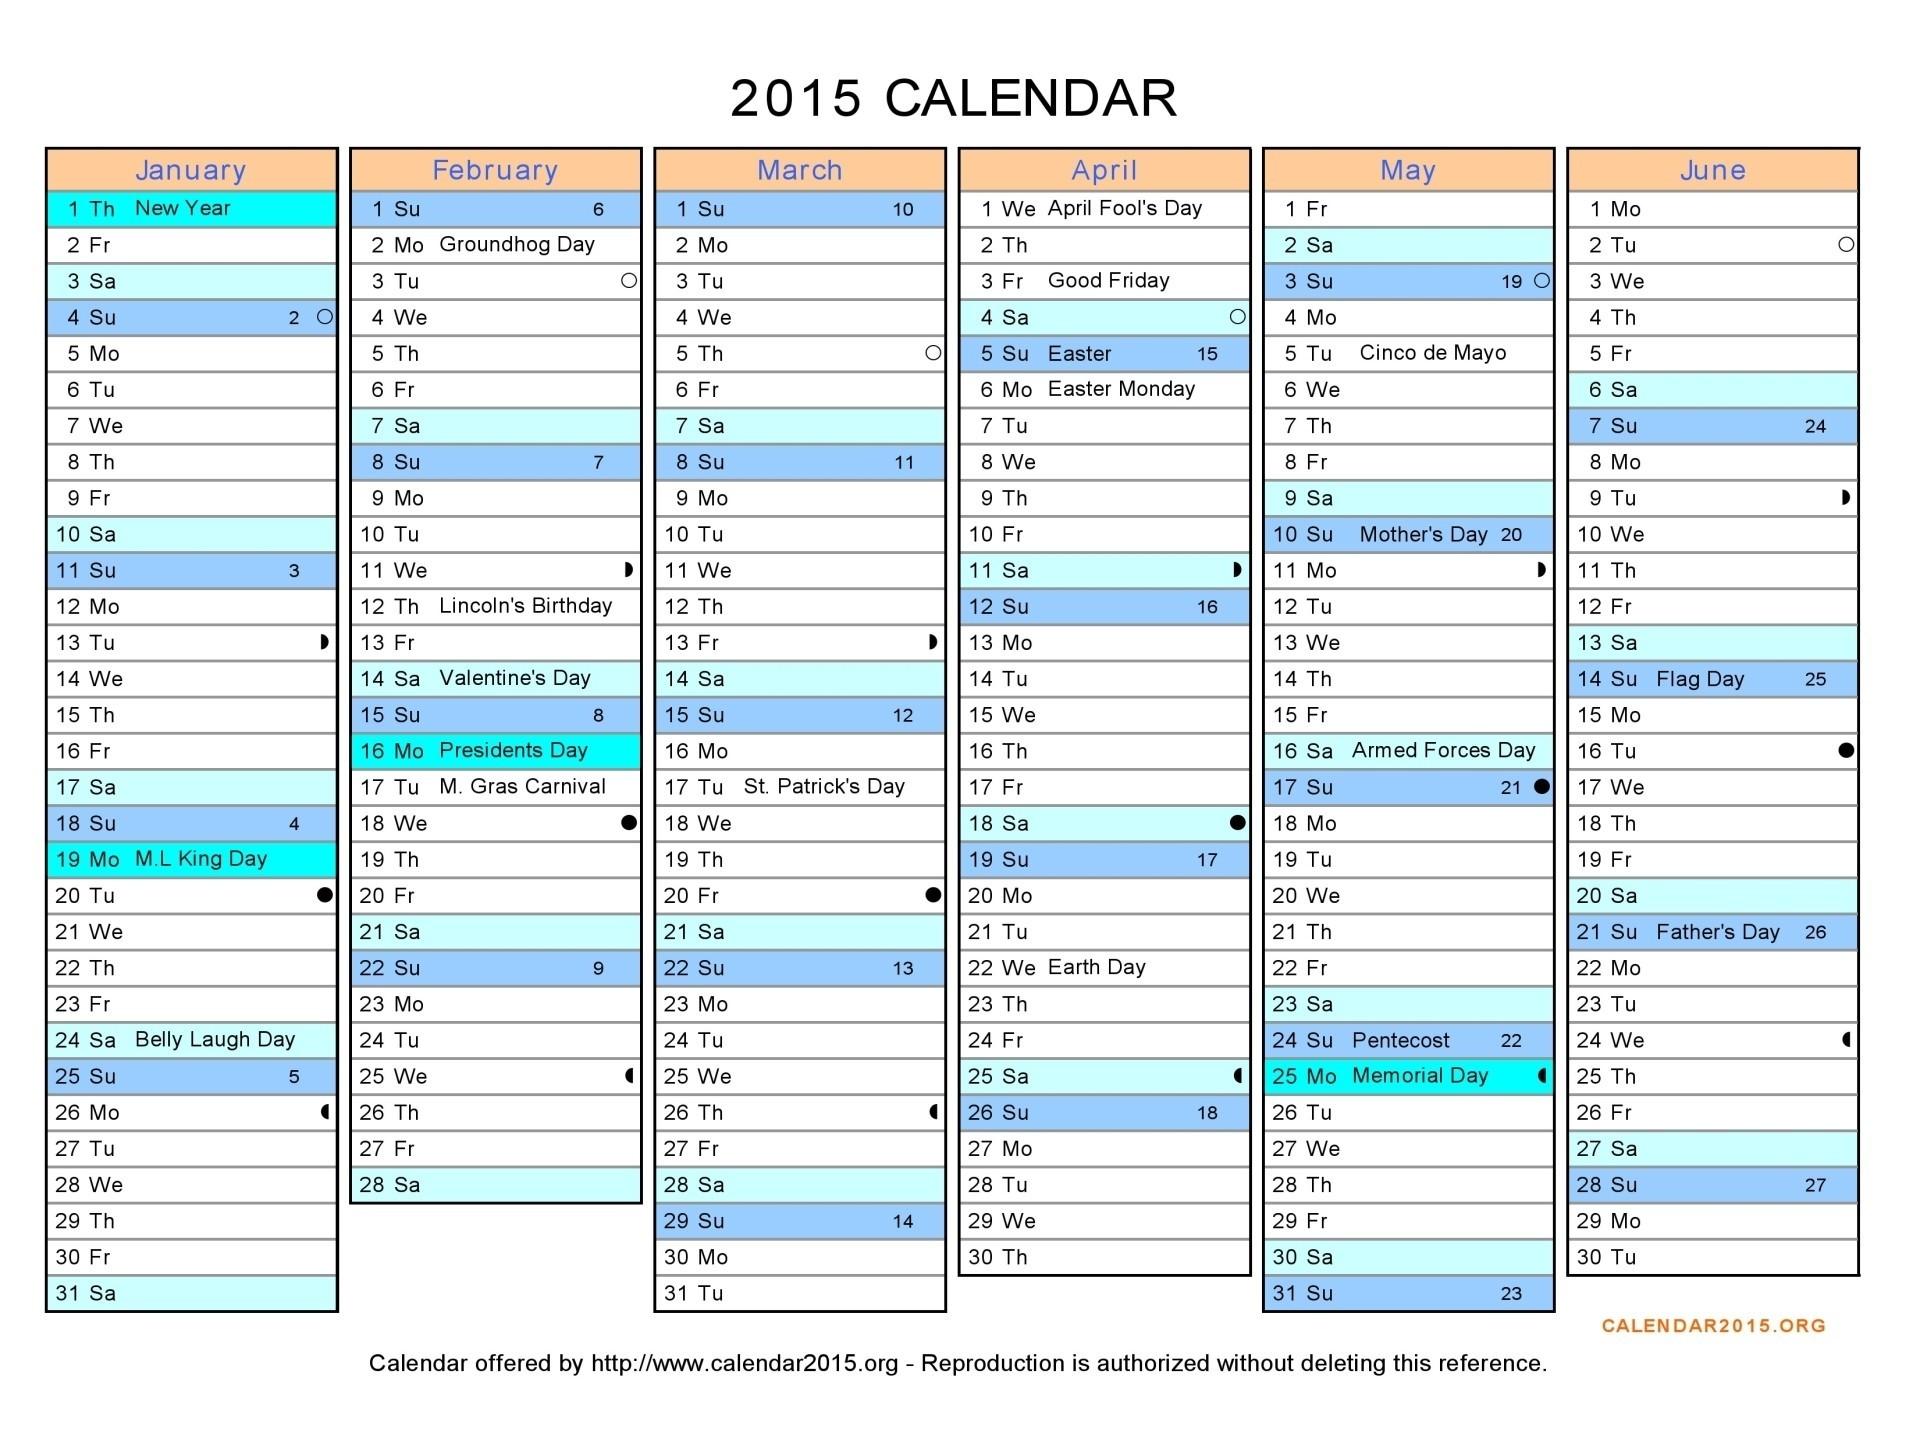 Ms Excel Calendar 2019 Excel 2015 Calendar Templates Vatozozdevelopment Ms Excel Calendar 2019 Excel 2015